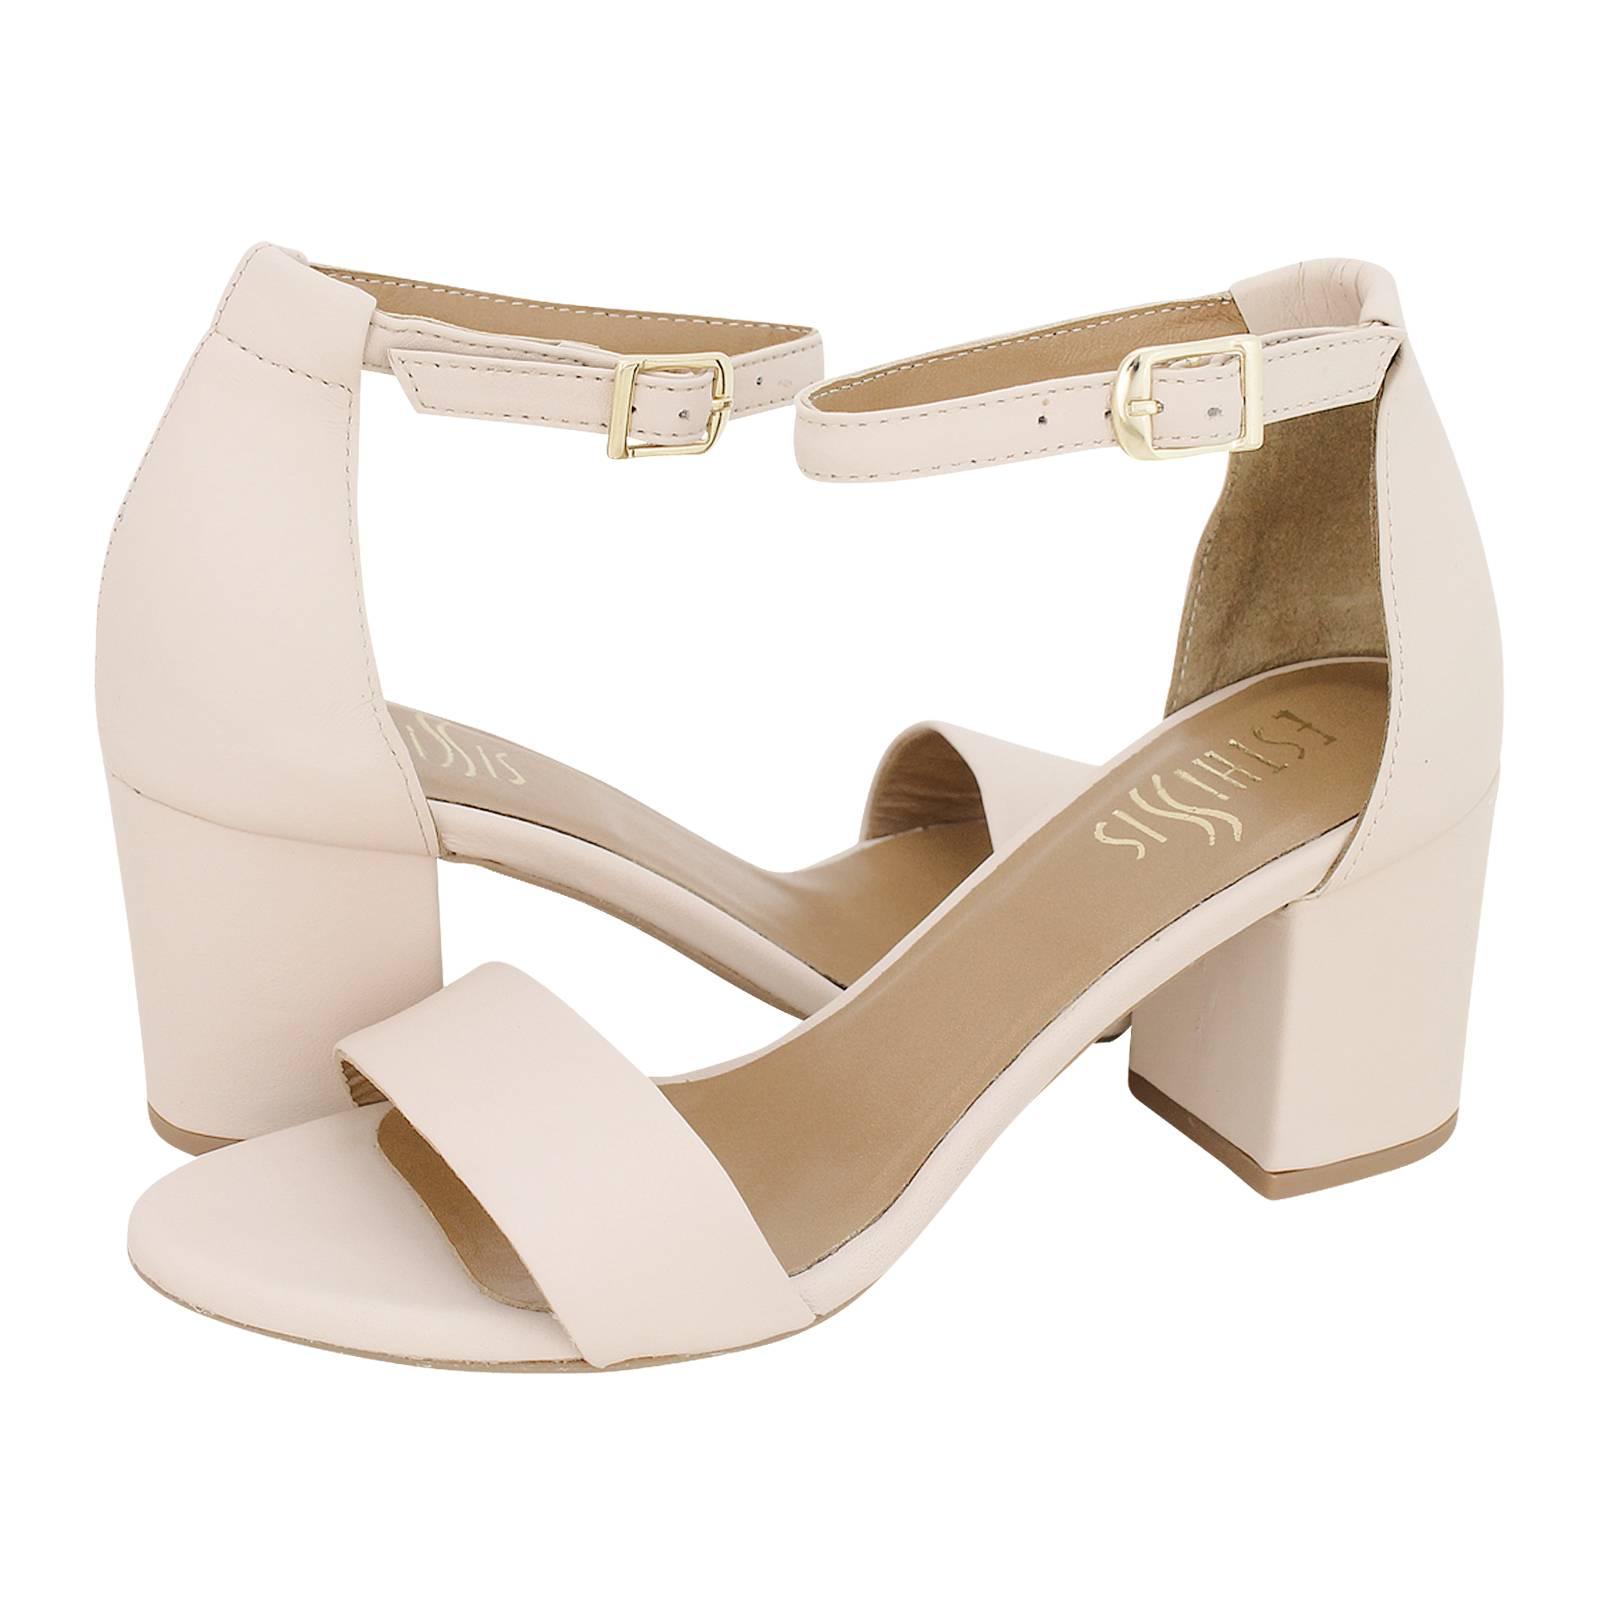 Suaza - Esthissis Women s sandals made of leather - Gianna Kazakou ... 32db10d6d2c